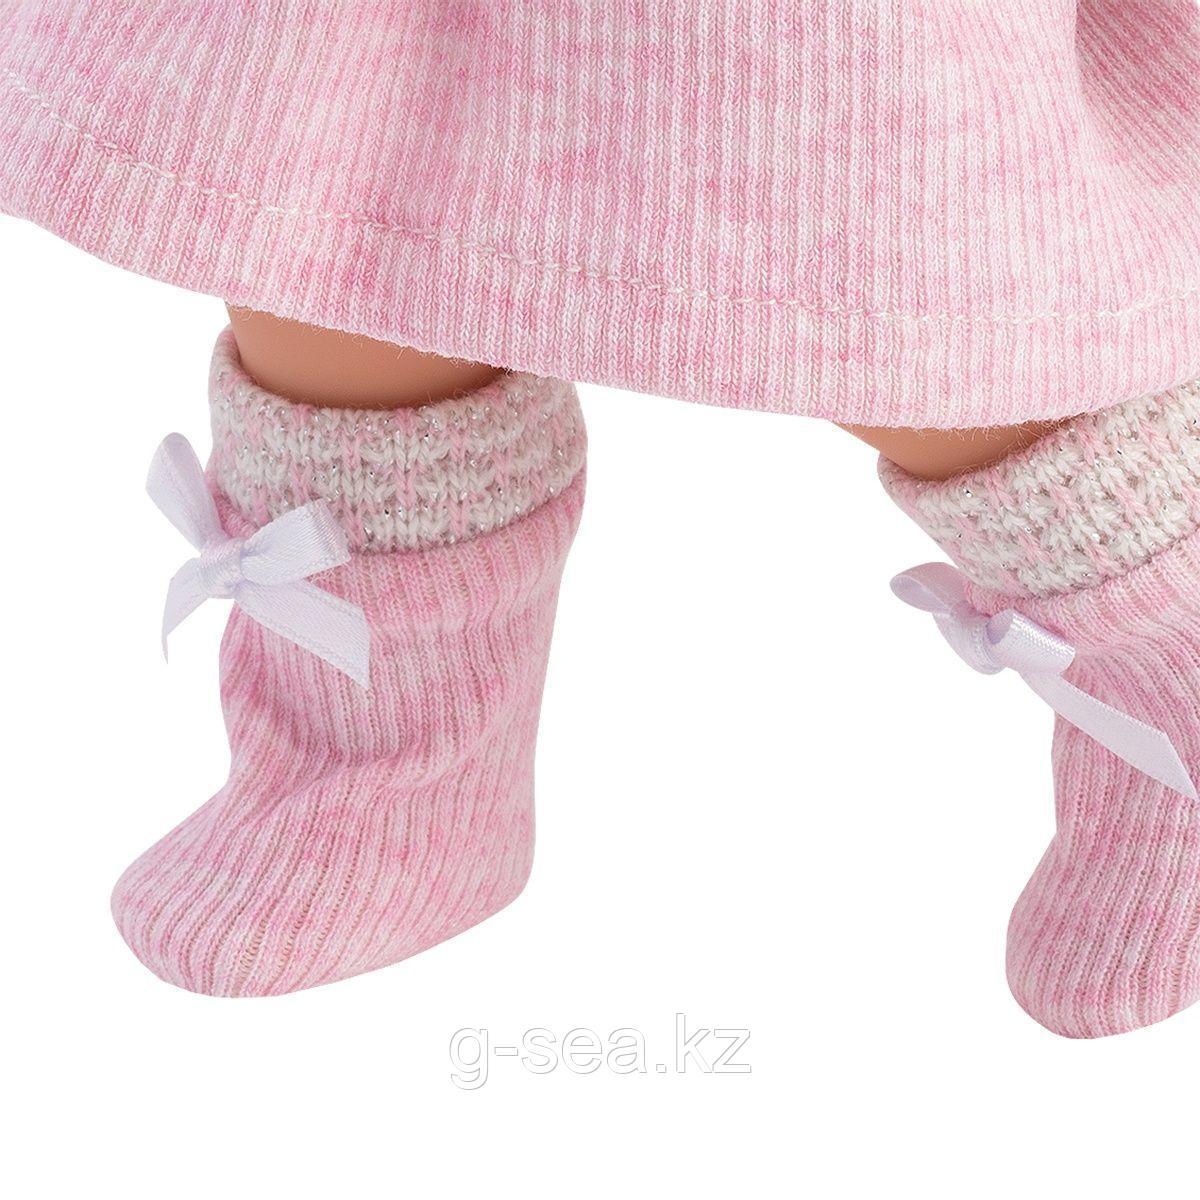 LLORENS: Кукла Валерия 28 см., блондинка в розовом костюме - фото 4